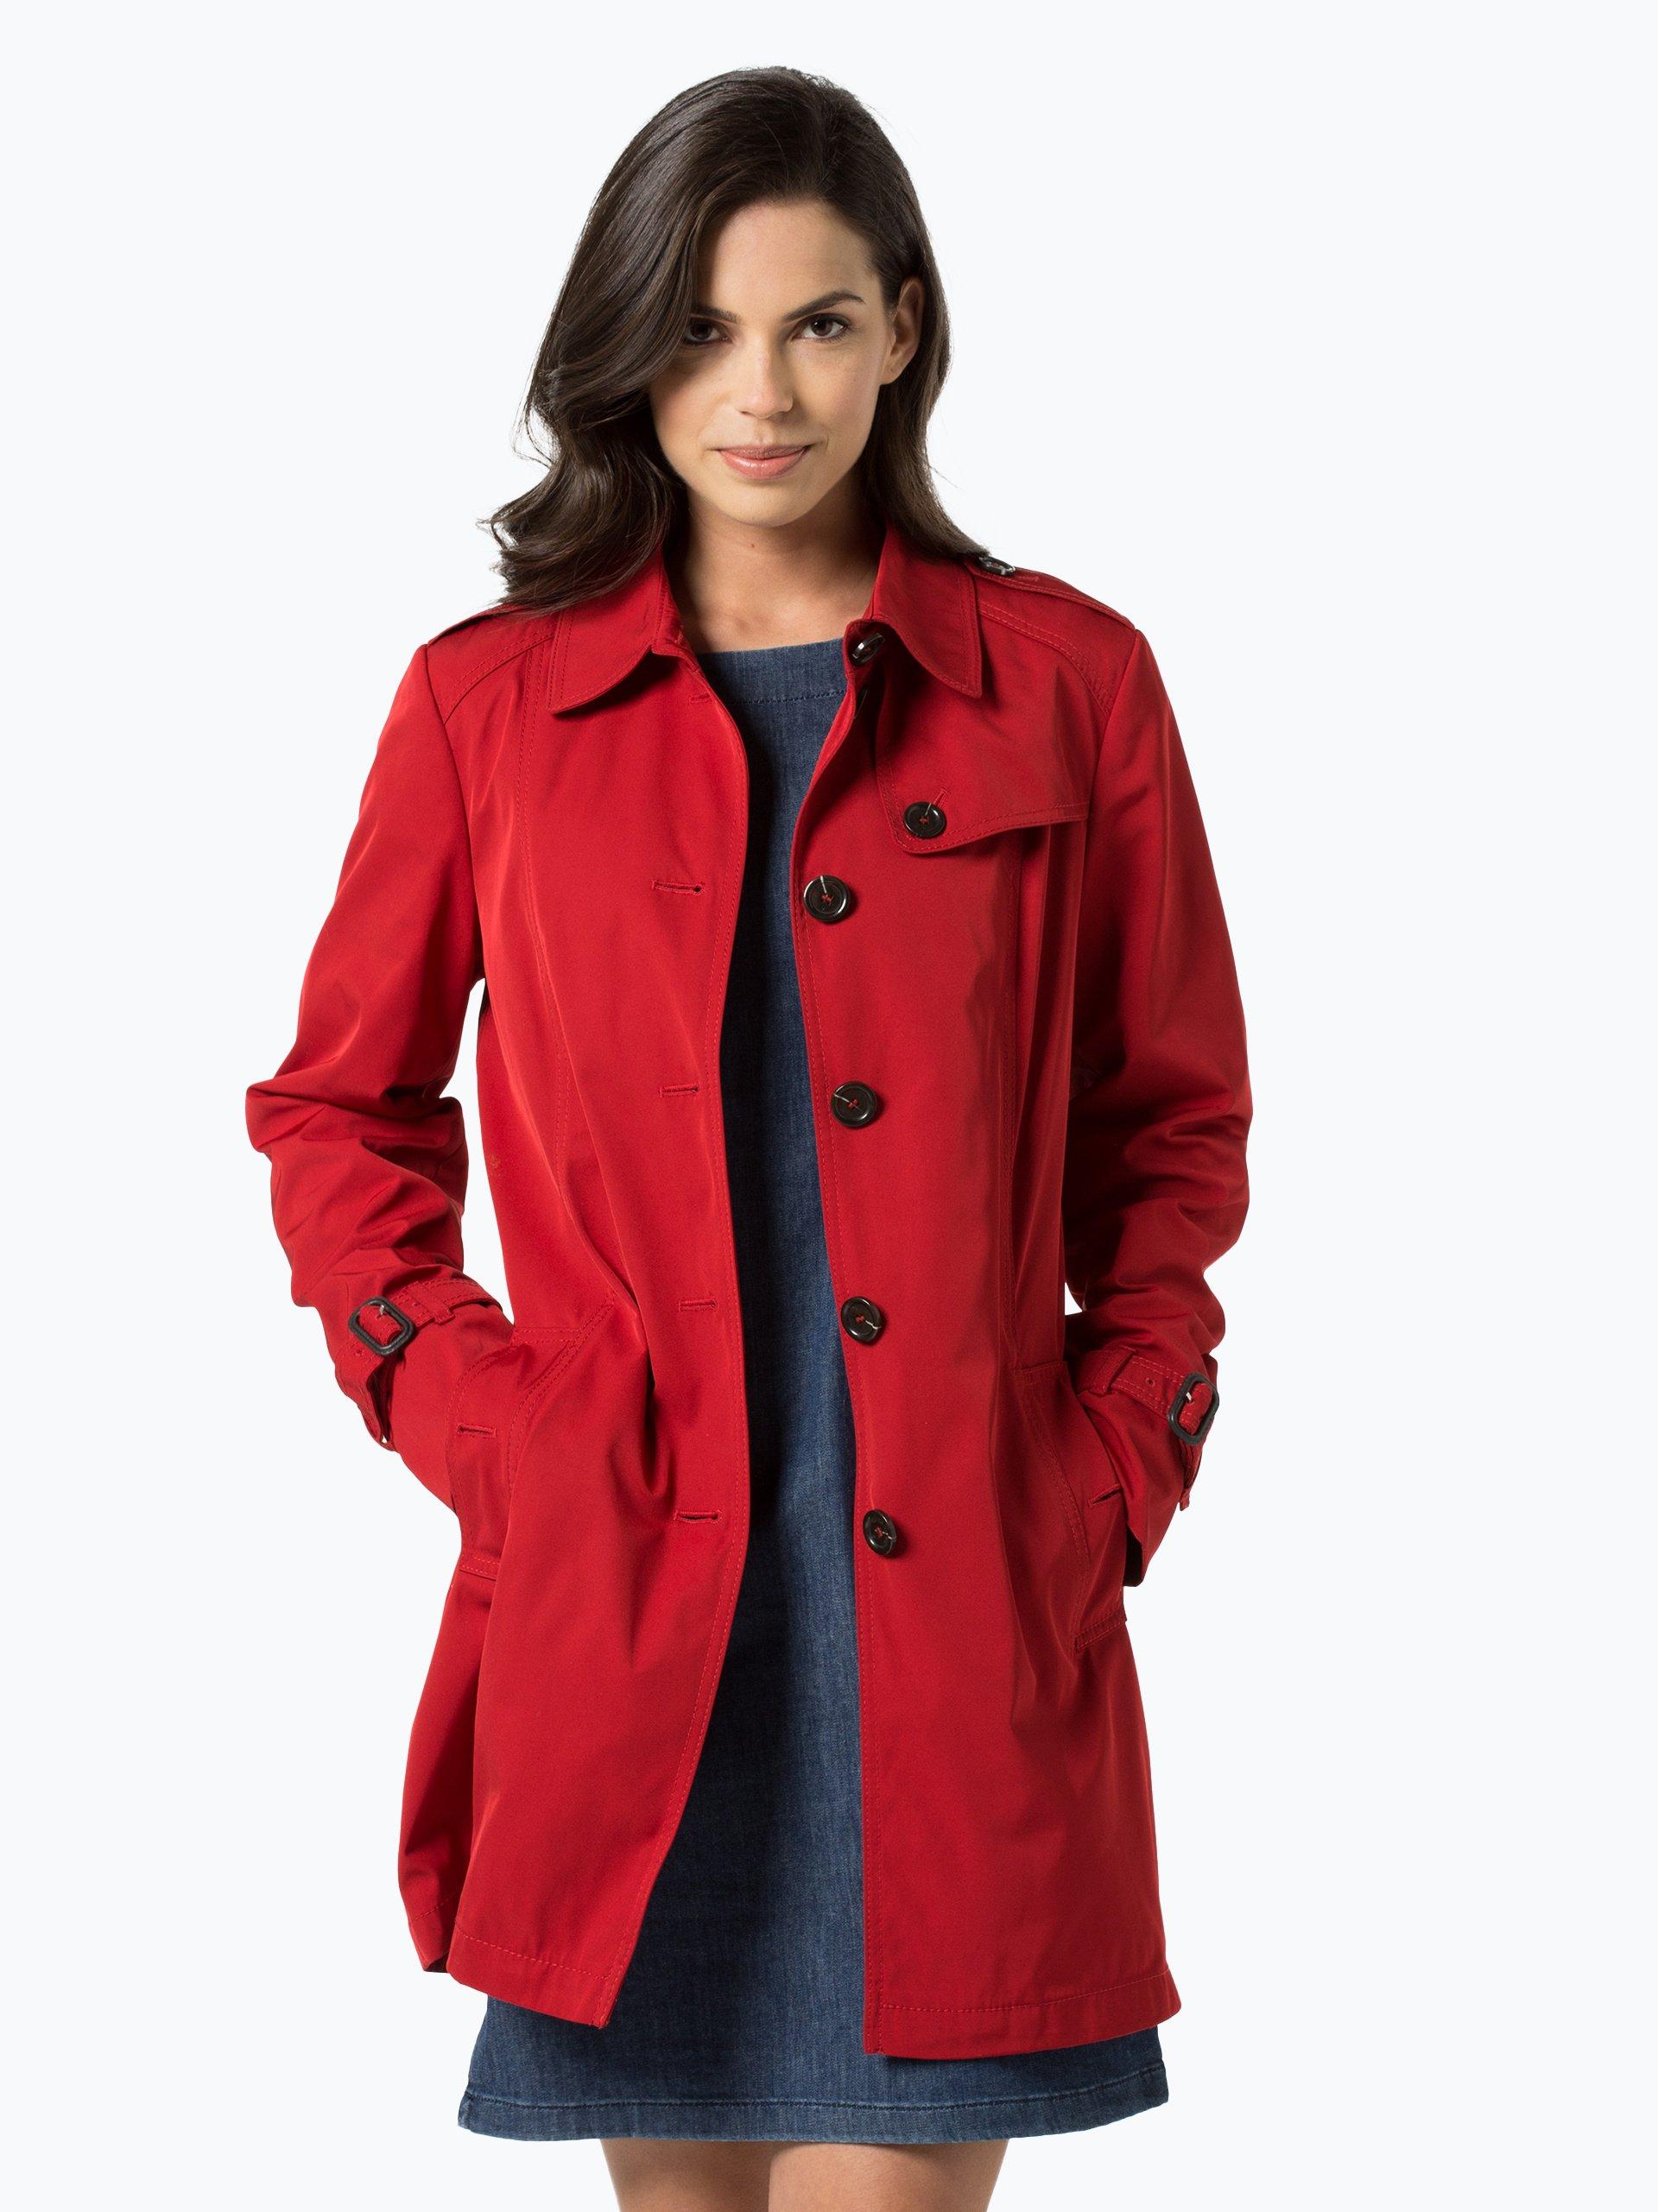 fuchs schmitt damen mantel rot uni online kaufen peek und cloppenburg de. Black Bedroom Furniture Sets. Home Design Ideas